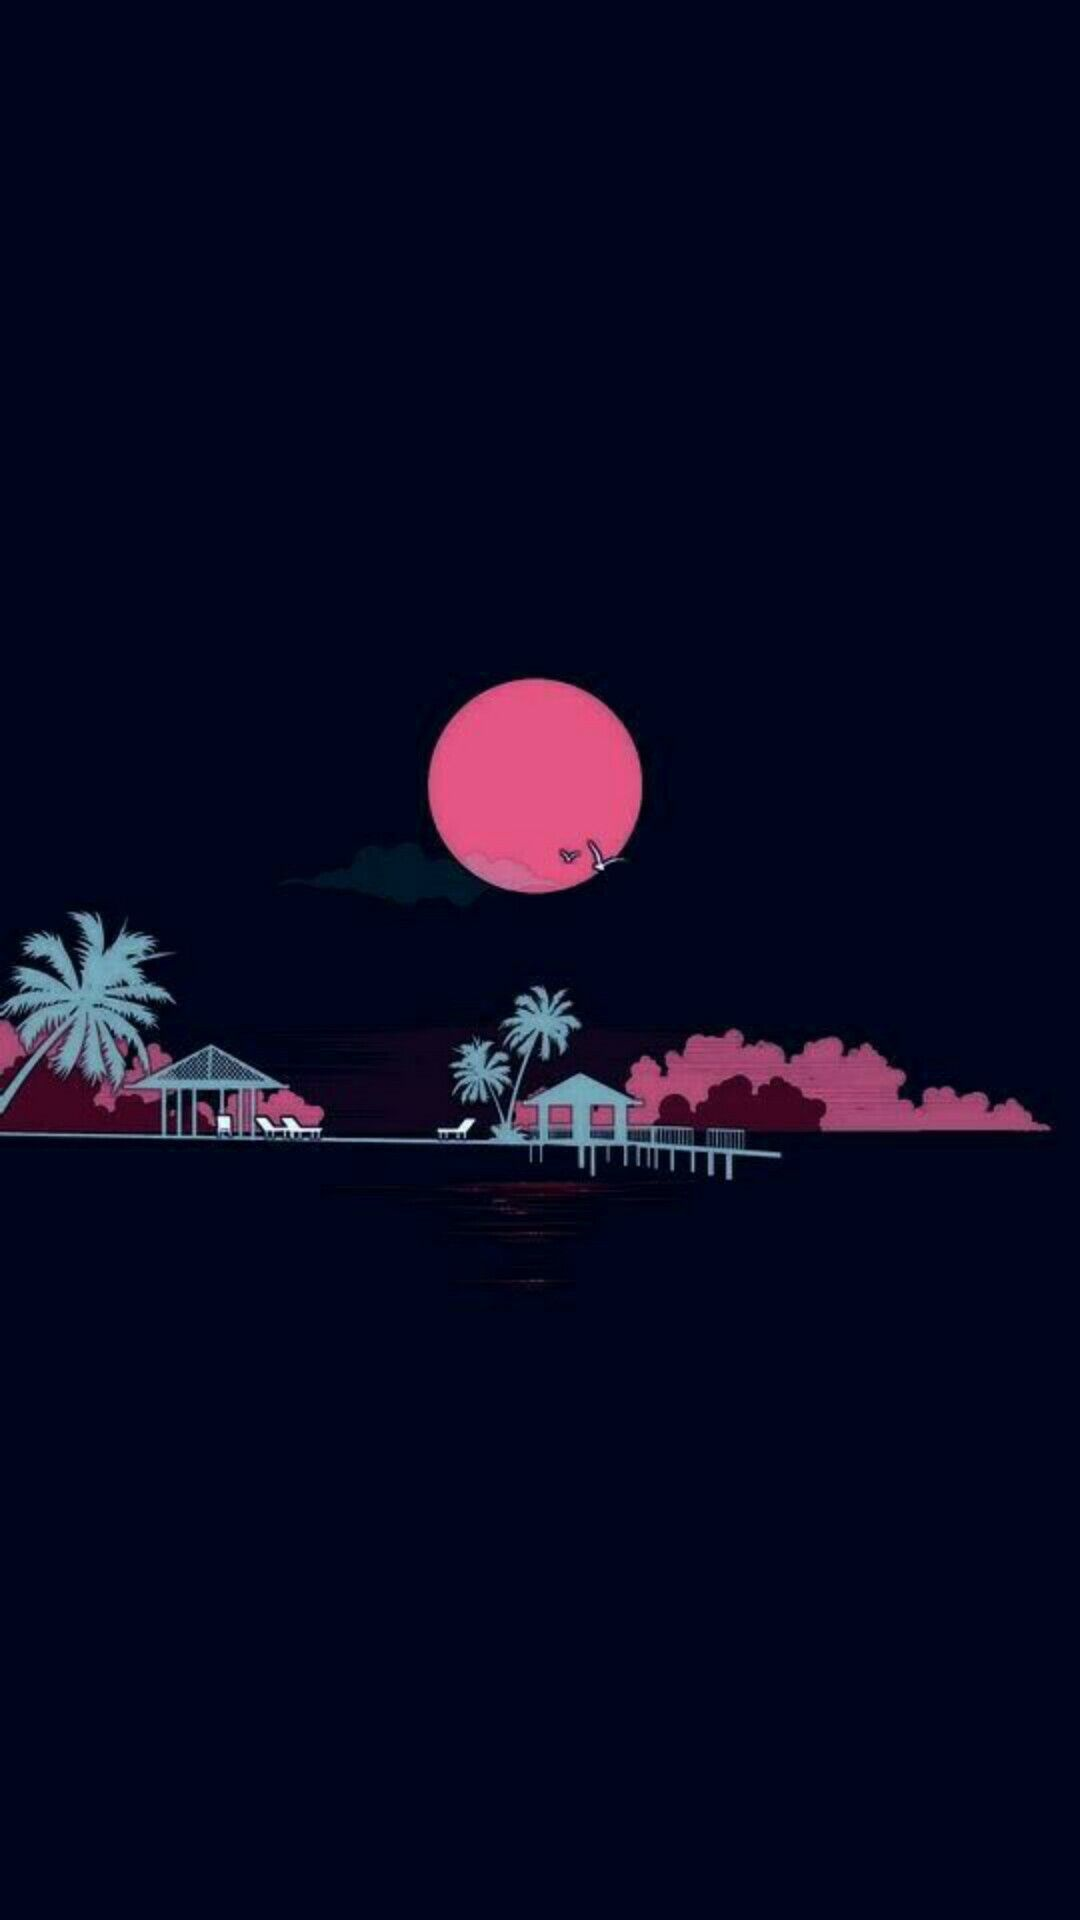 Smartphone wallpaper / Simplistic / Beach / Palm trees